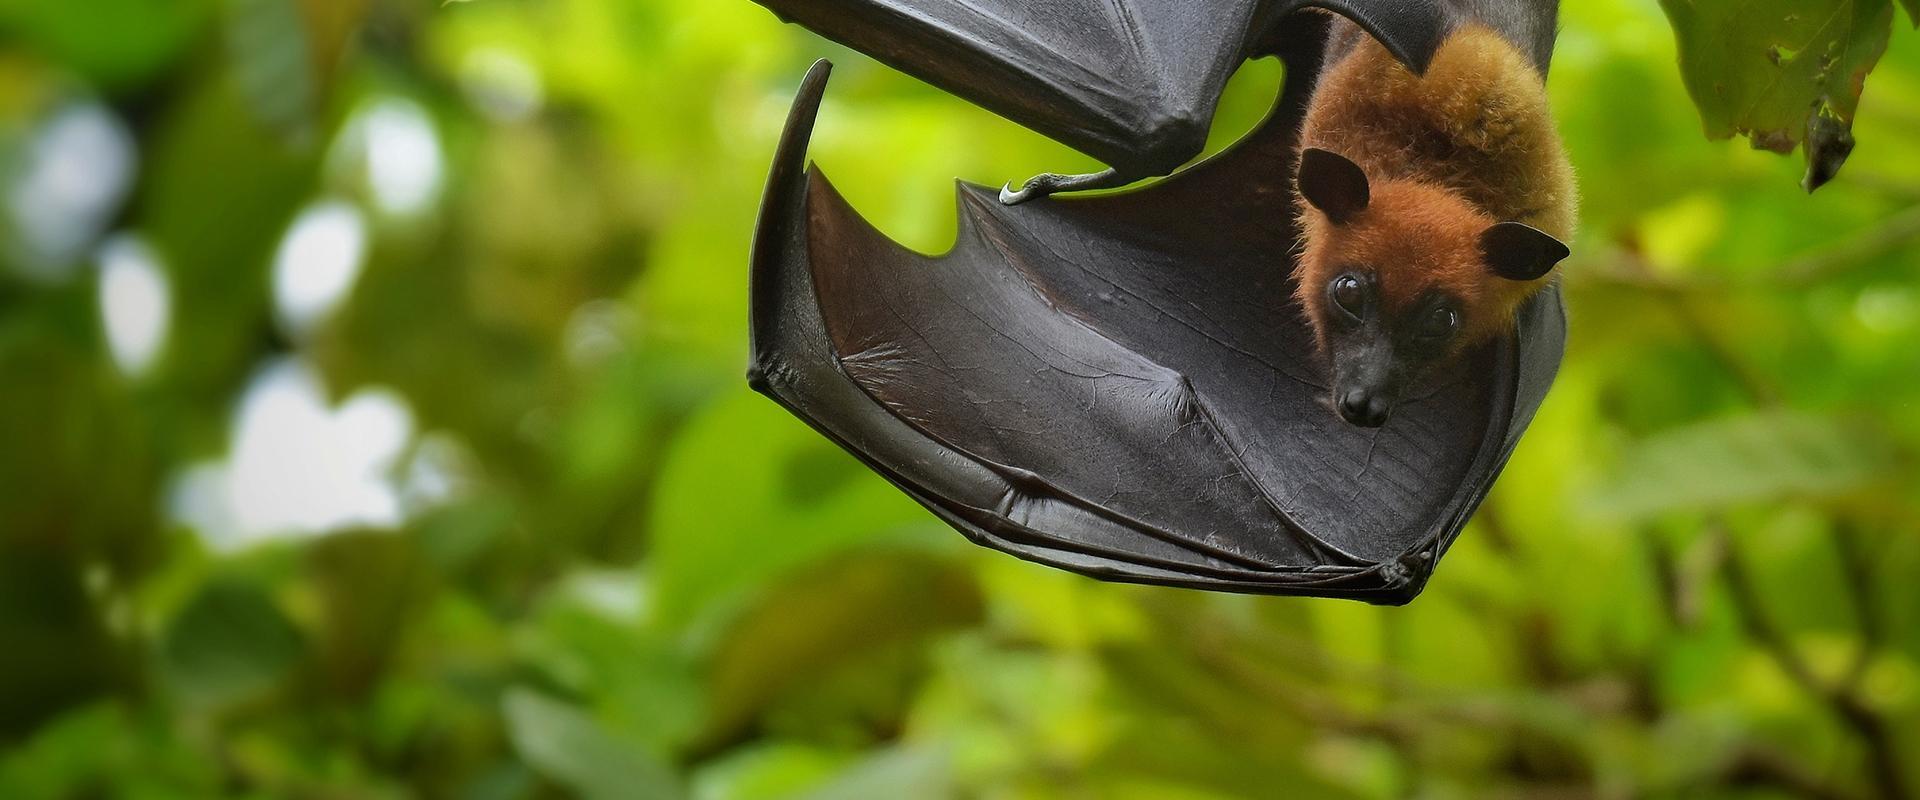 bats flying in a line